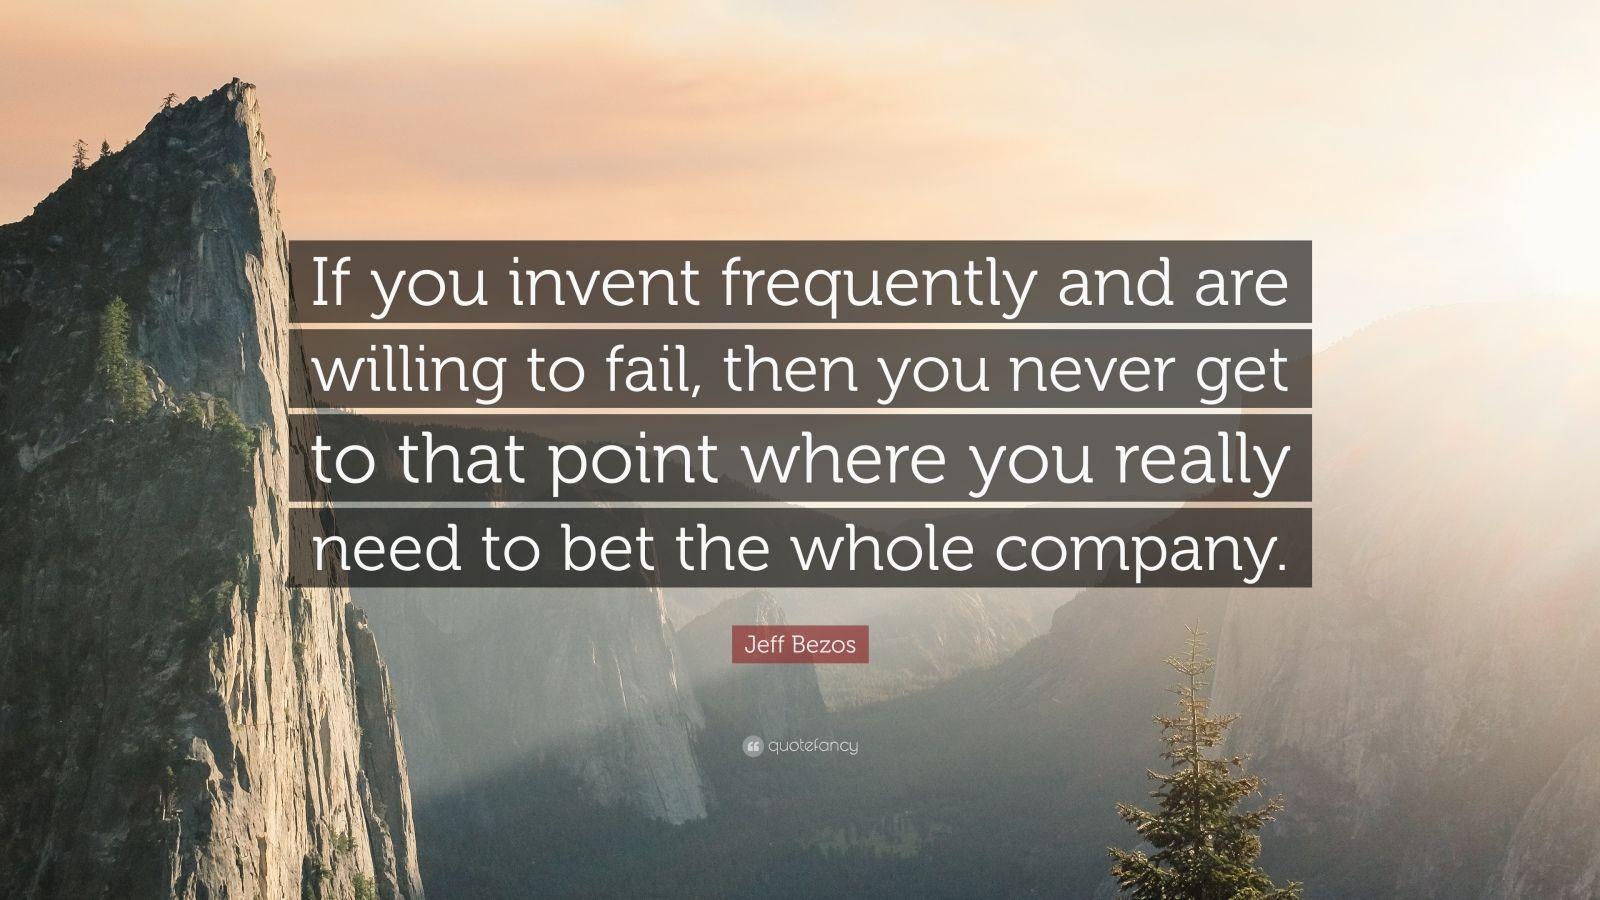 Jeff Bezos Quotes 100 Wallpapers Quotefancy